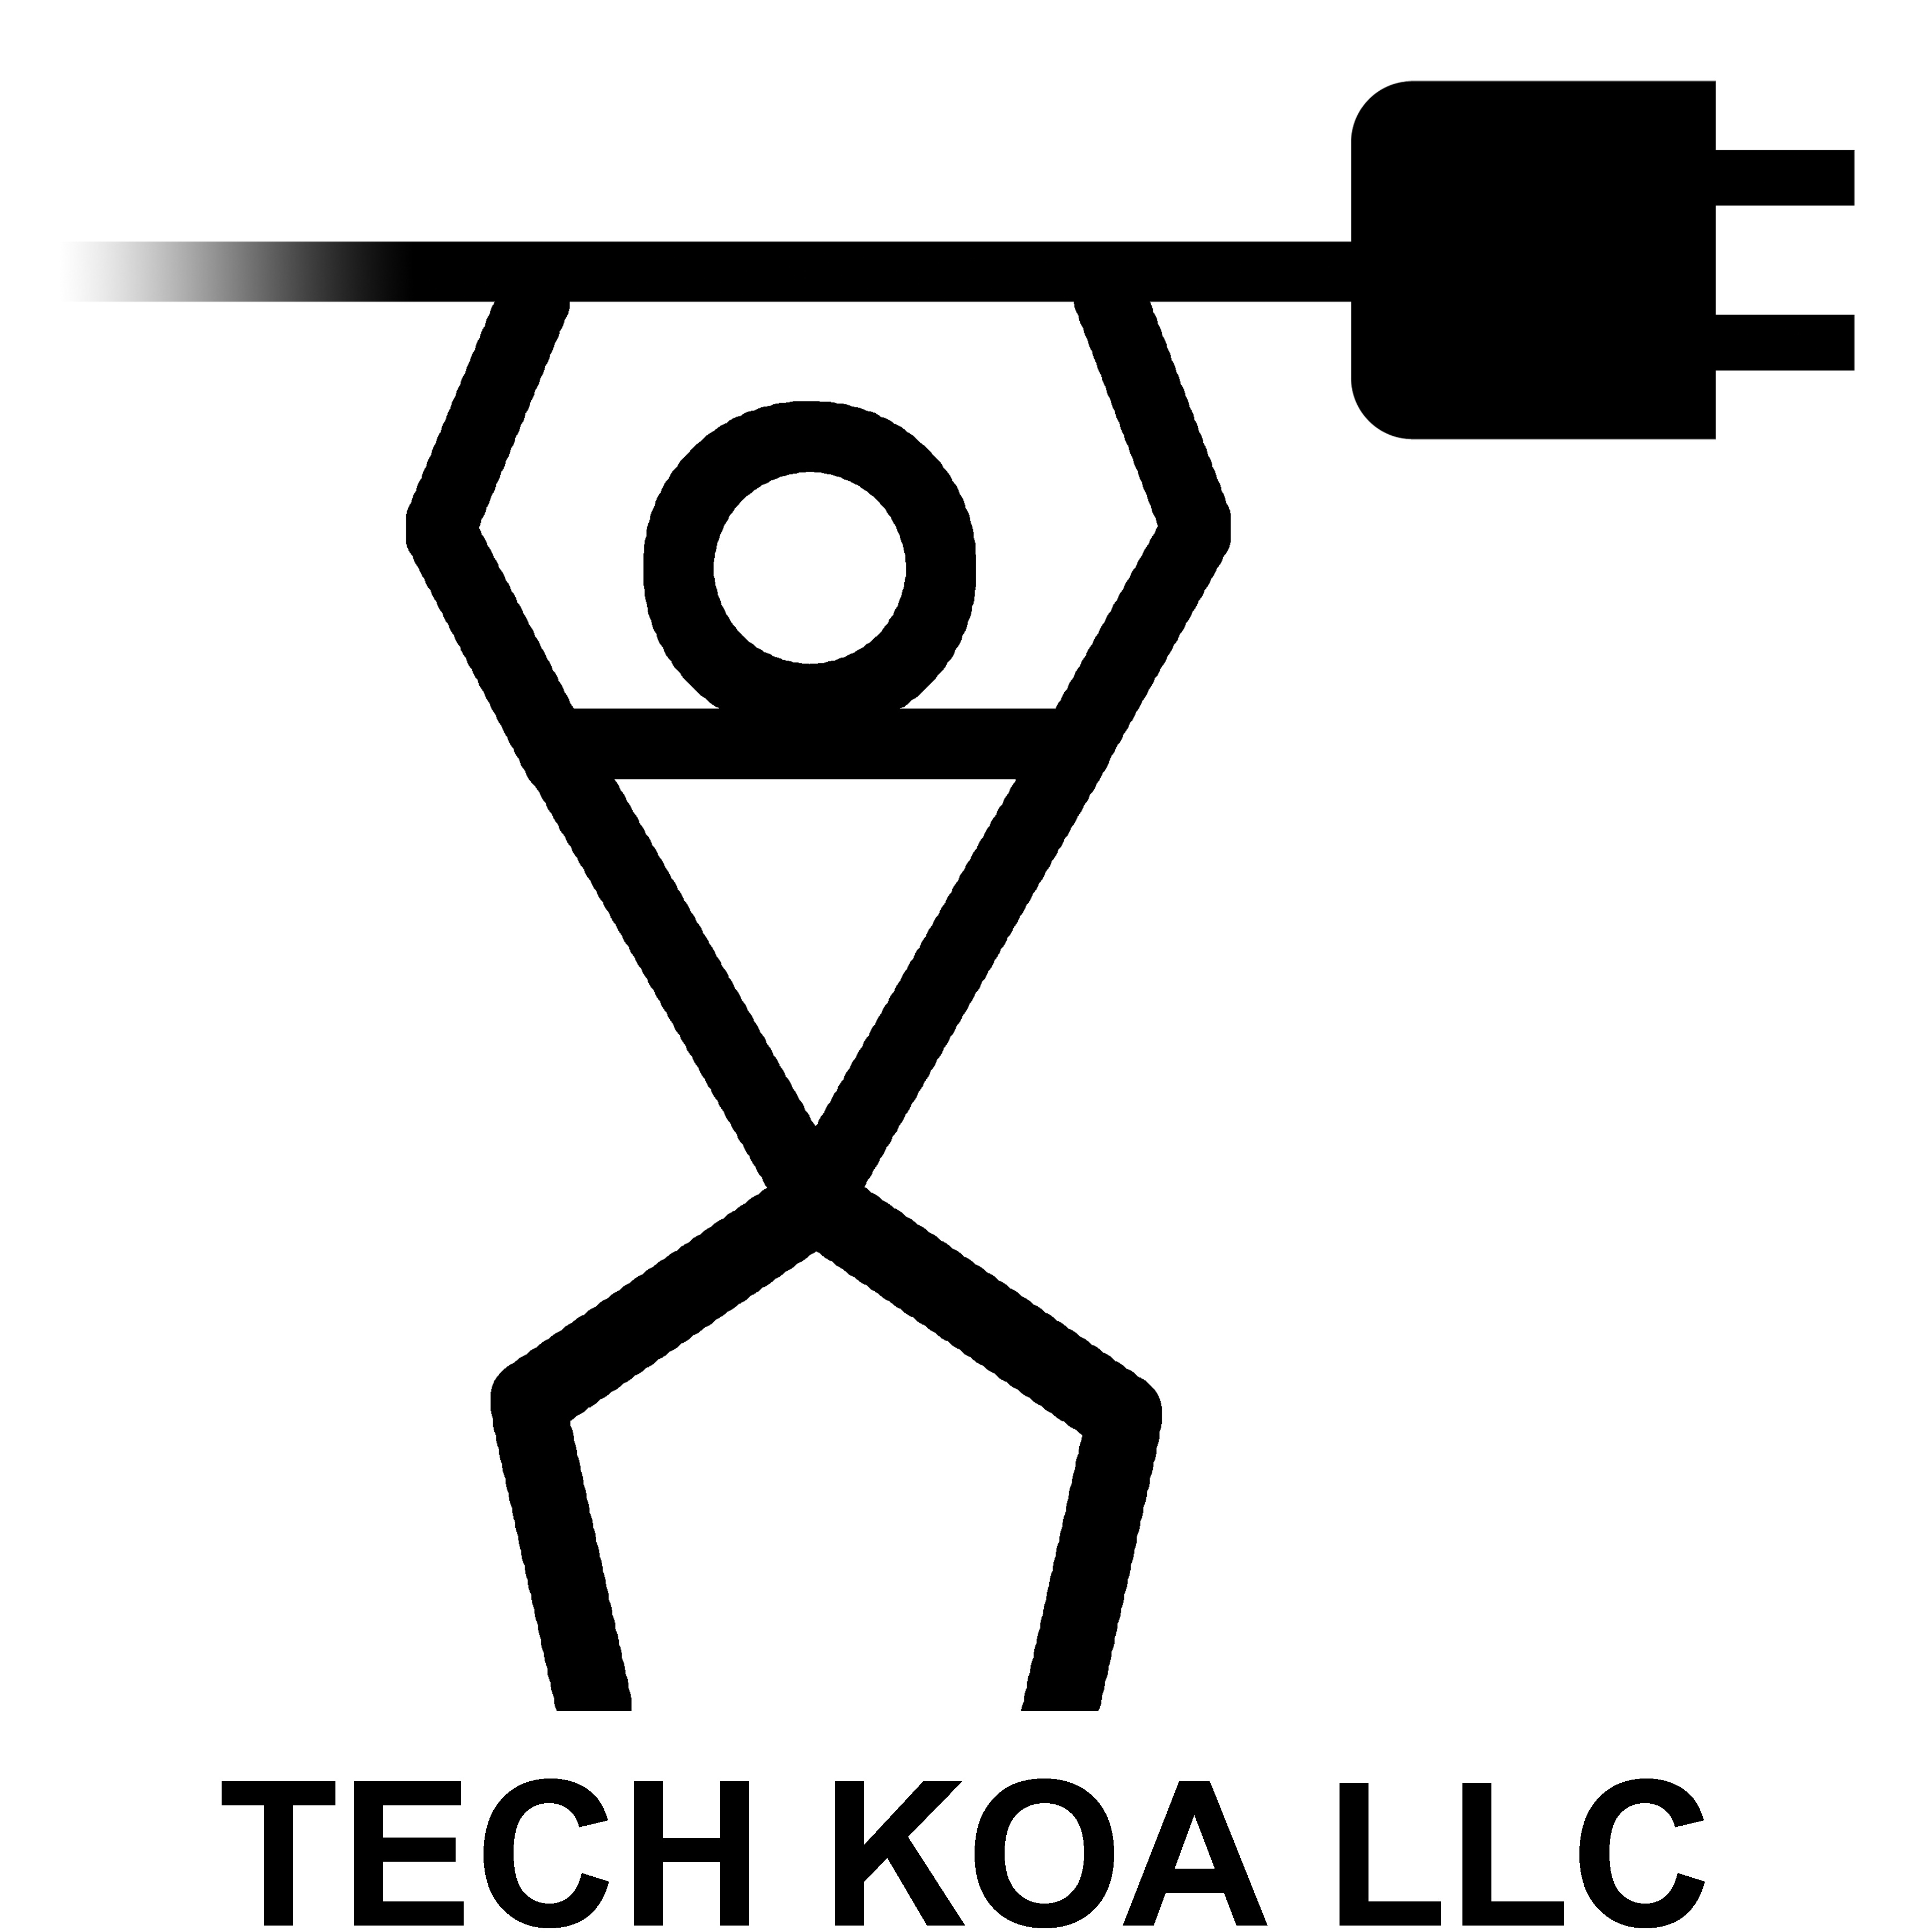 tech_koa_logo_w_ArialBold2.jpg